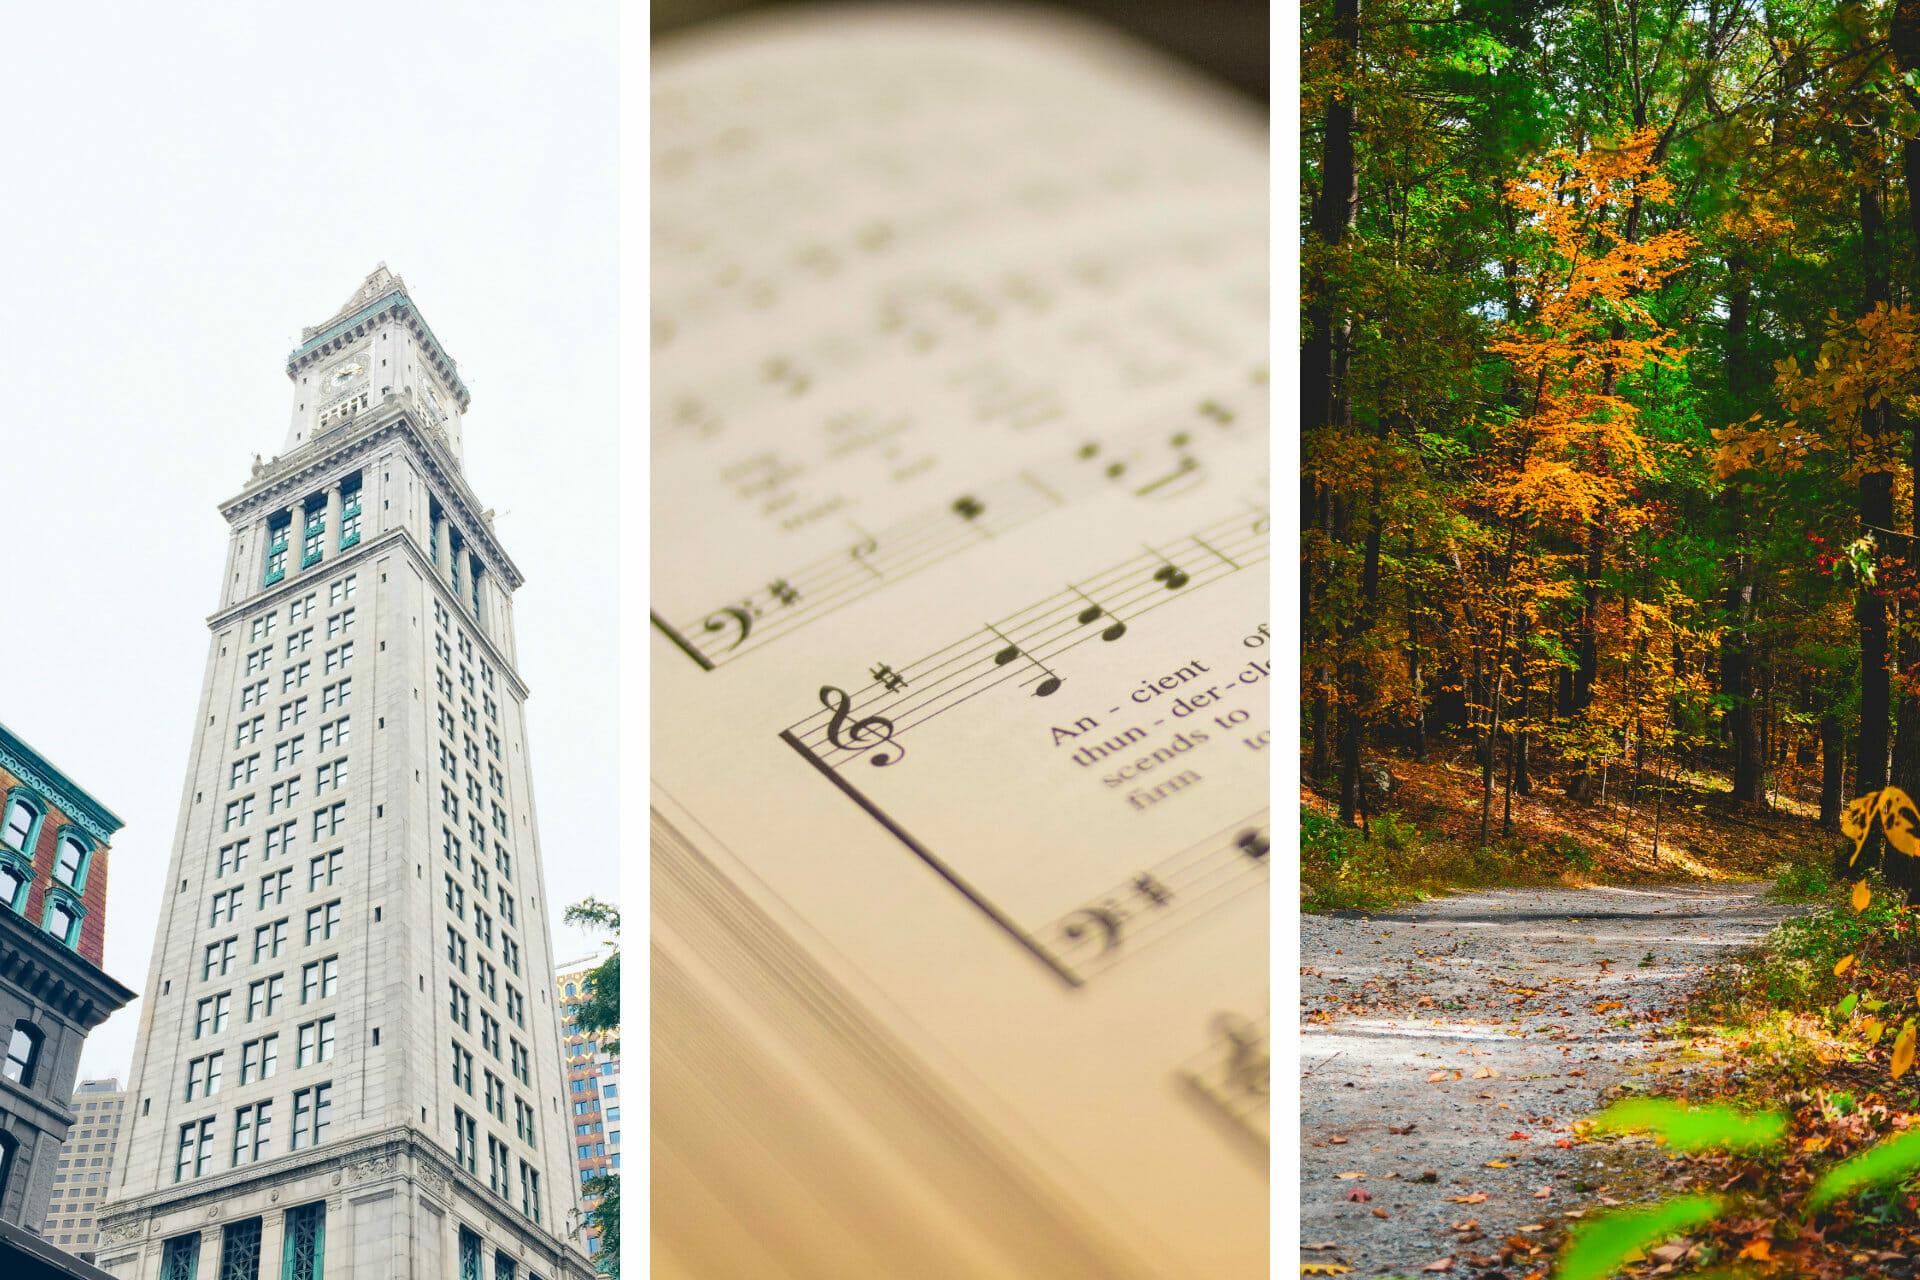 17+ Iconic Songs about Massachusetts to Make You Smile via @allamericanatlas